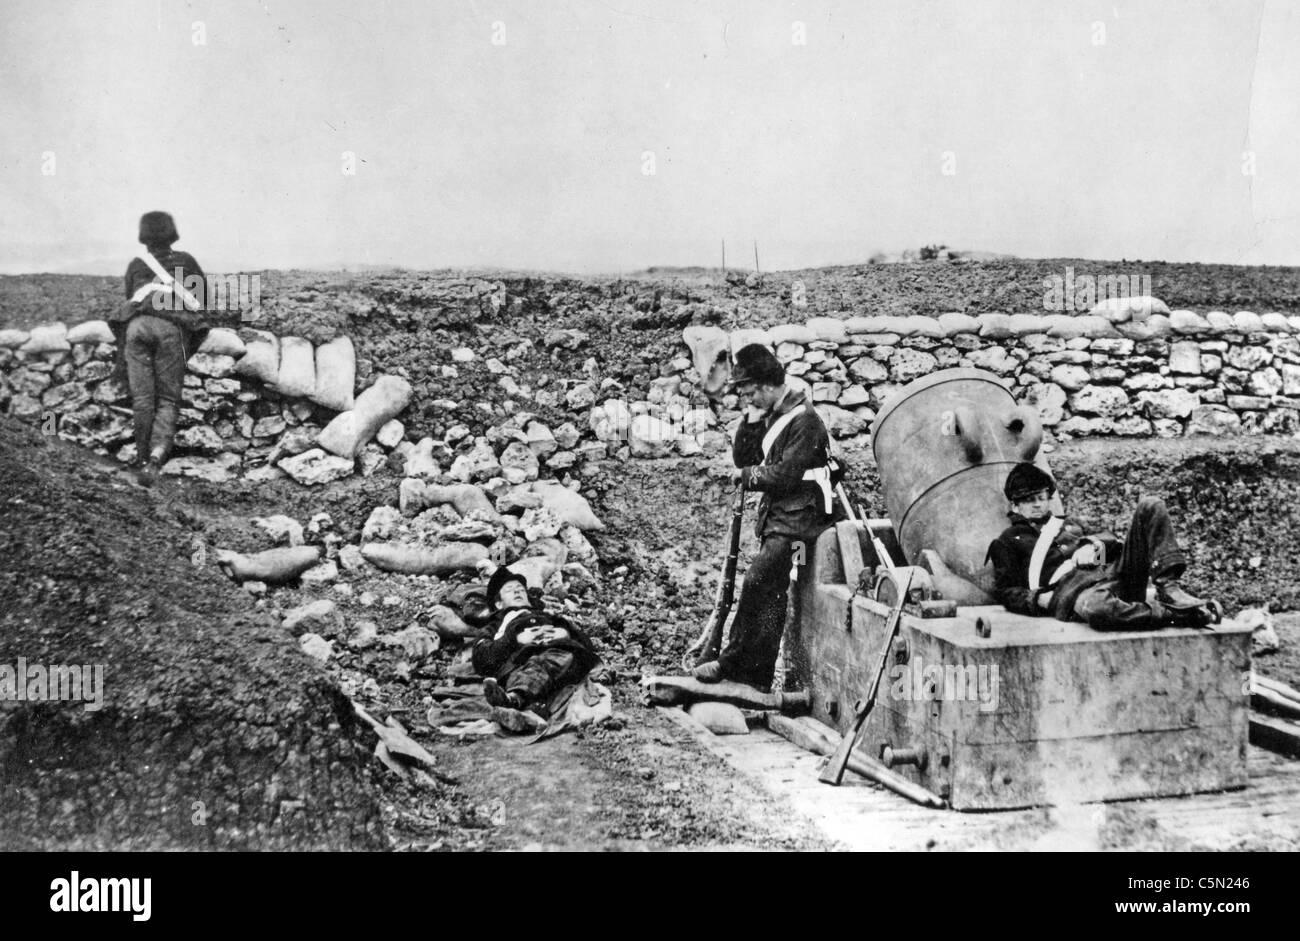 CRIMEAN WAR (1853-1856) British mortar battery. Roger Fenton - Stock Image